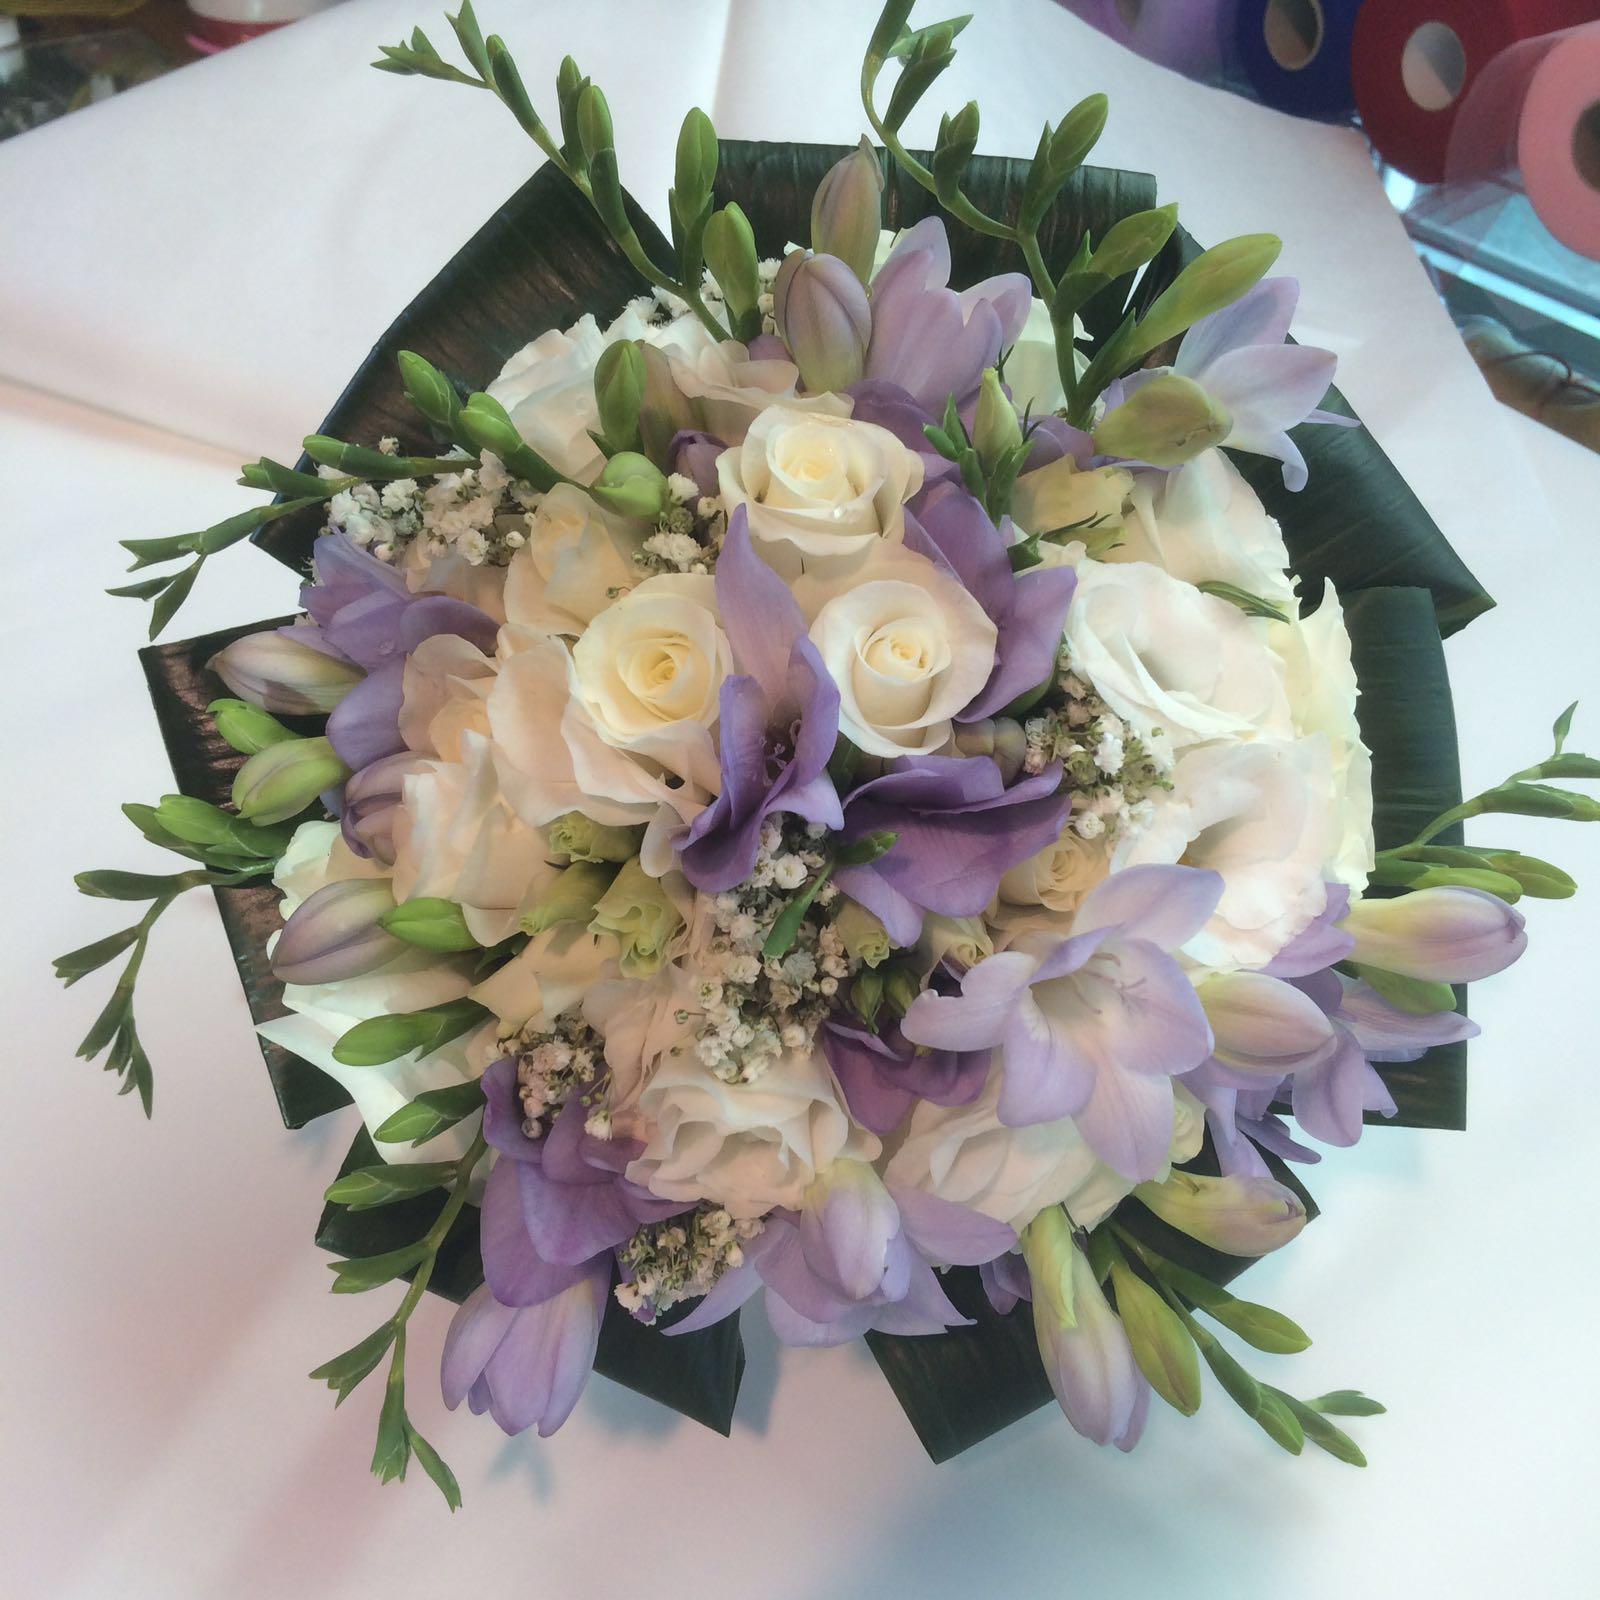 Bouquet Ortensie E Rose : Bouquets di rose tagliabue il verde